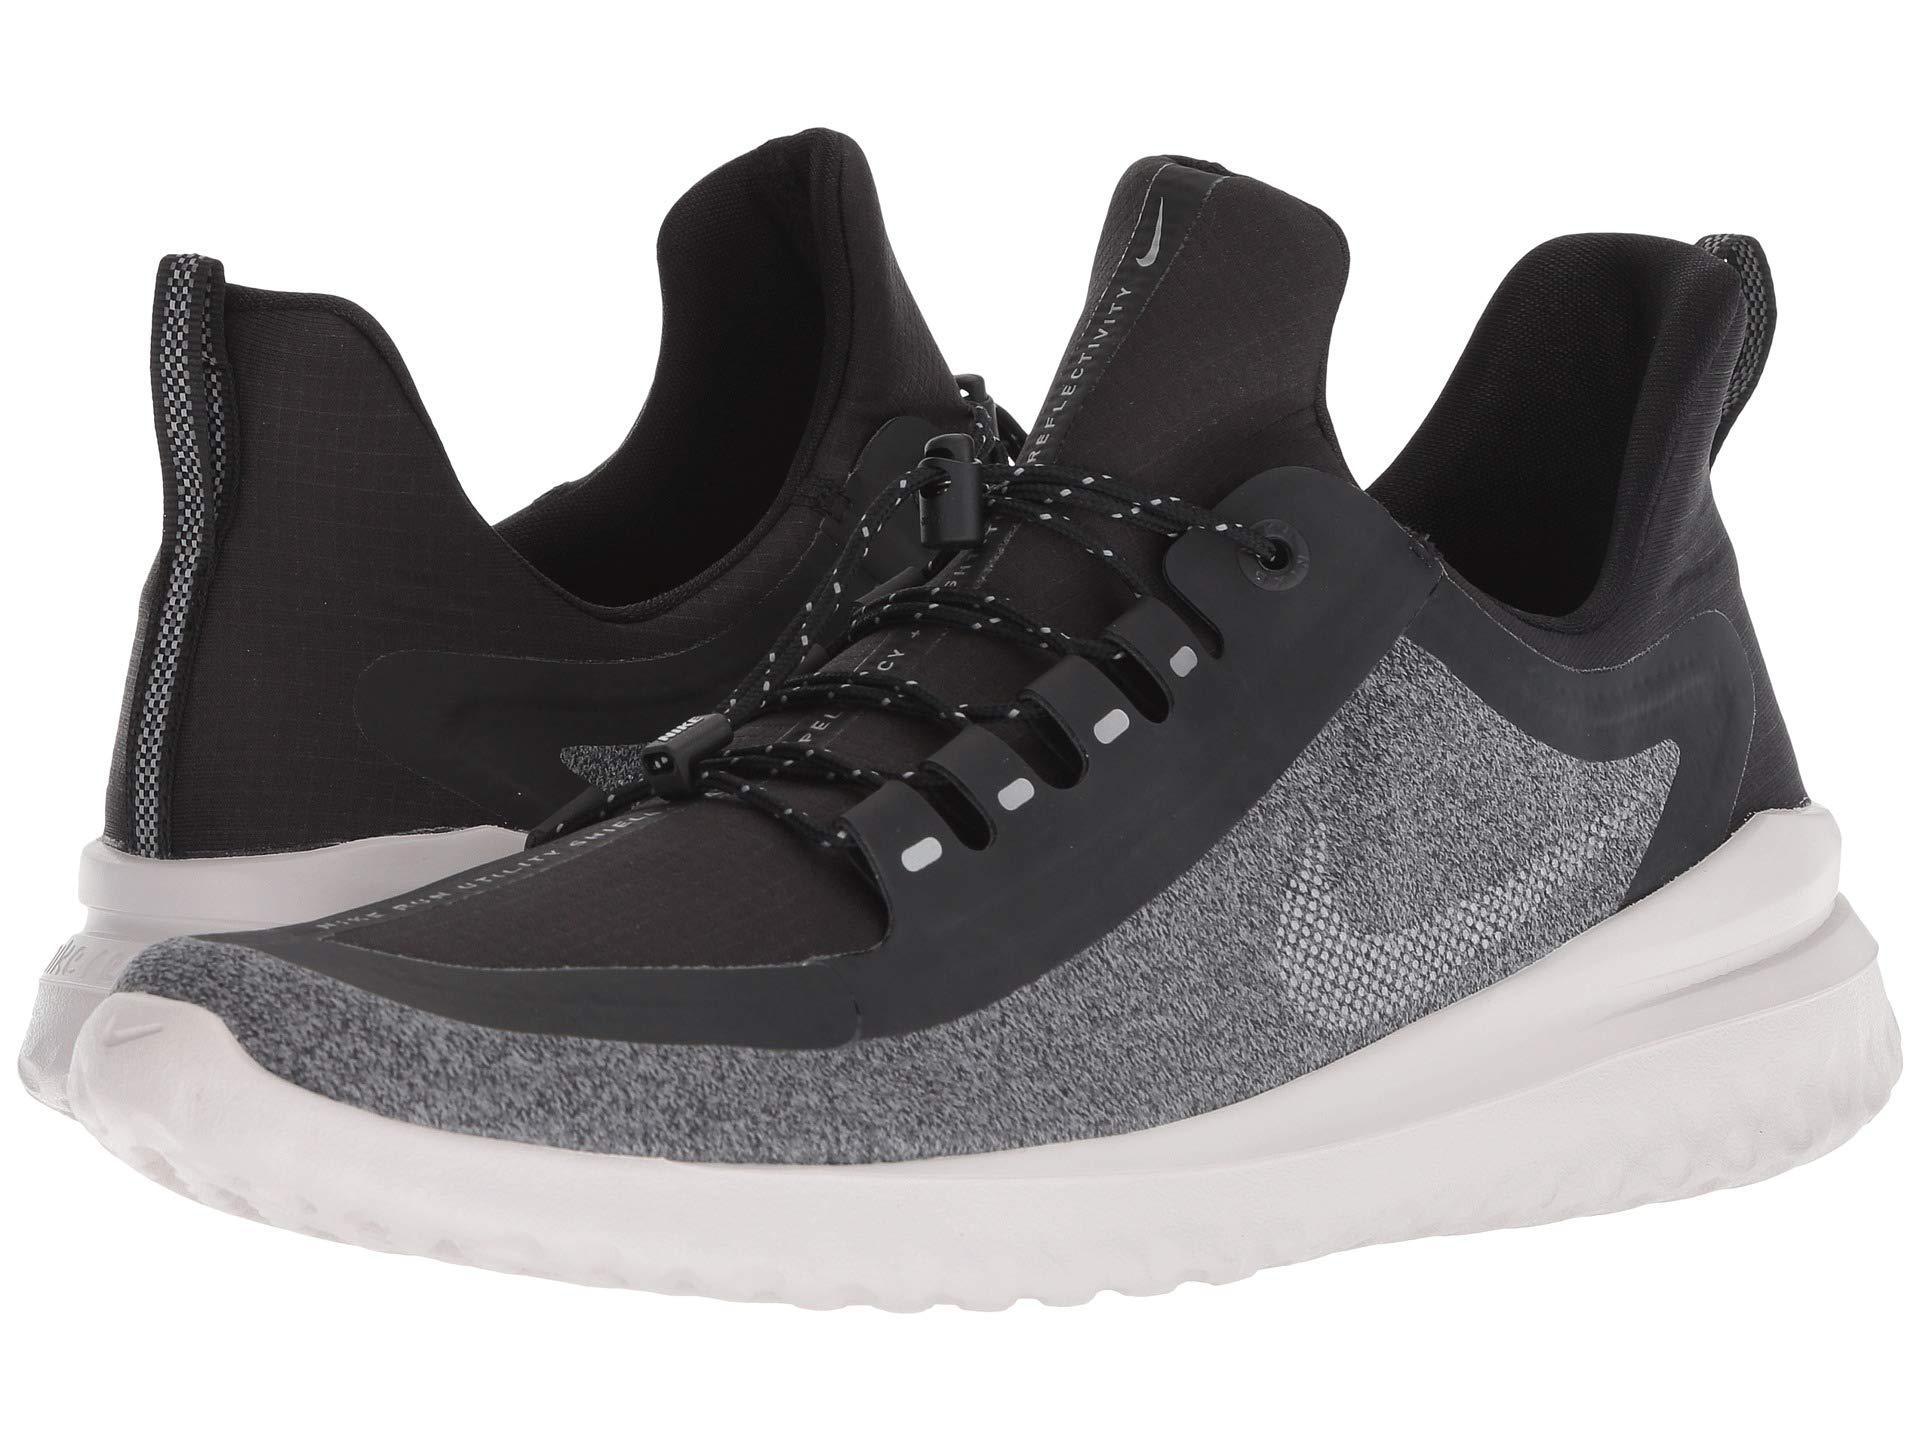 d3ca92896cf2 Nike. Renew Rival Shield (black metallic Silver cool Grey) Men s Running  Shoes